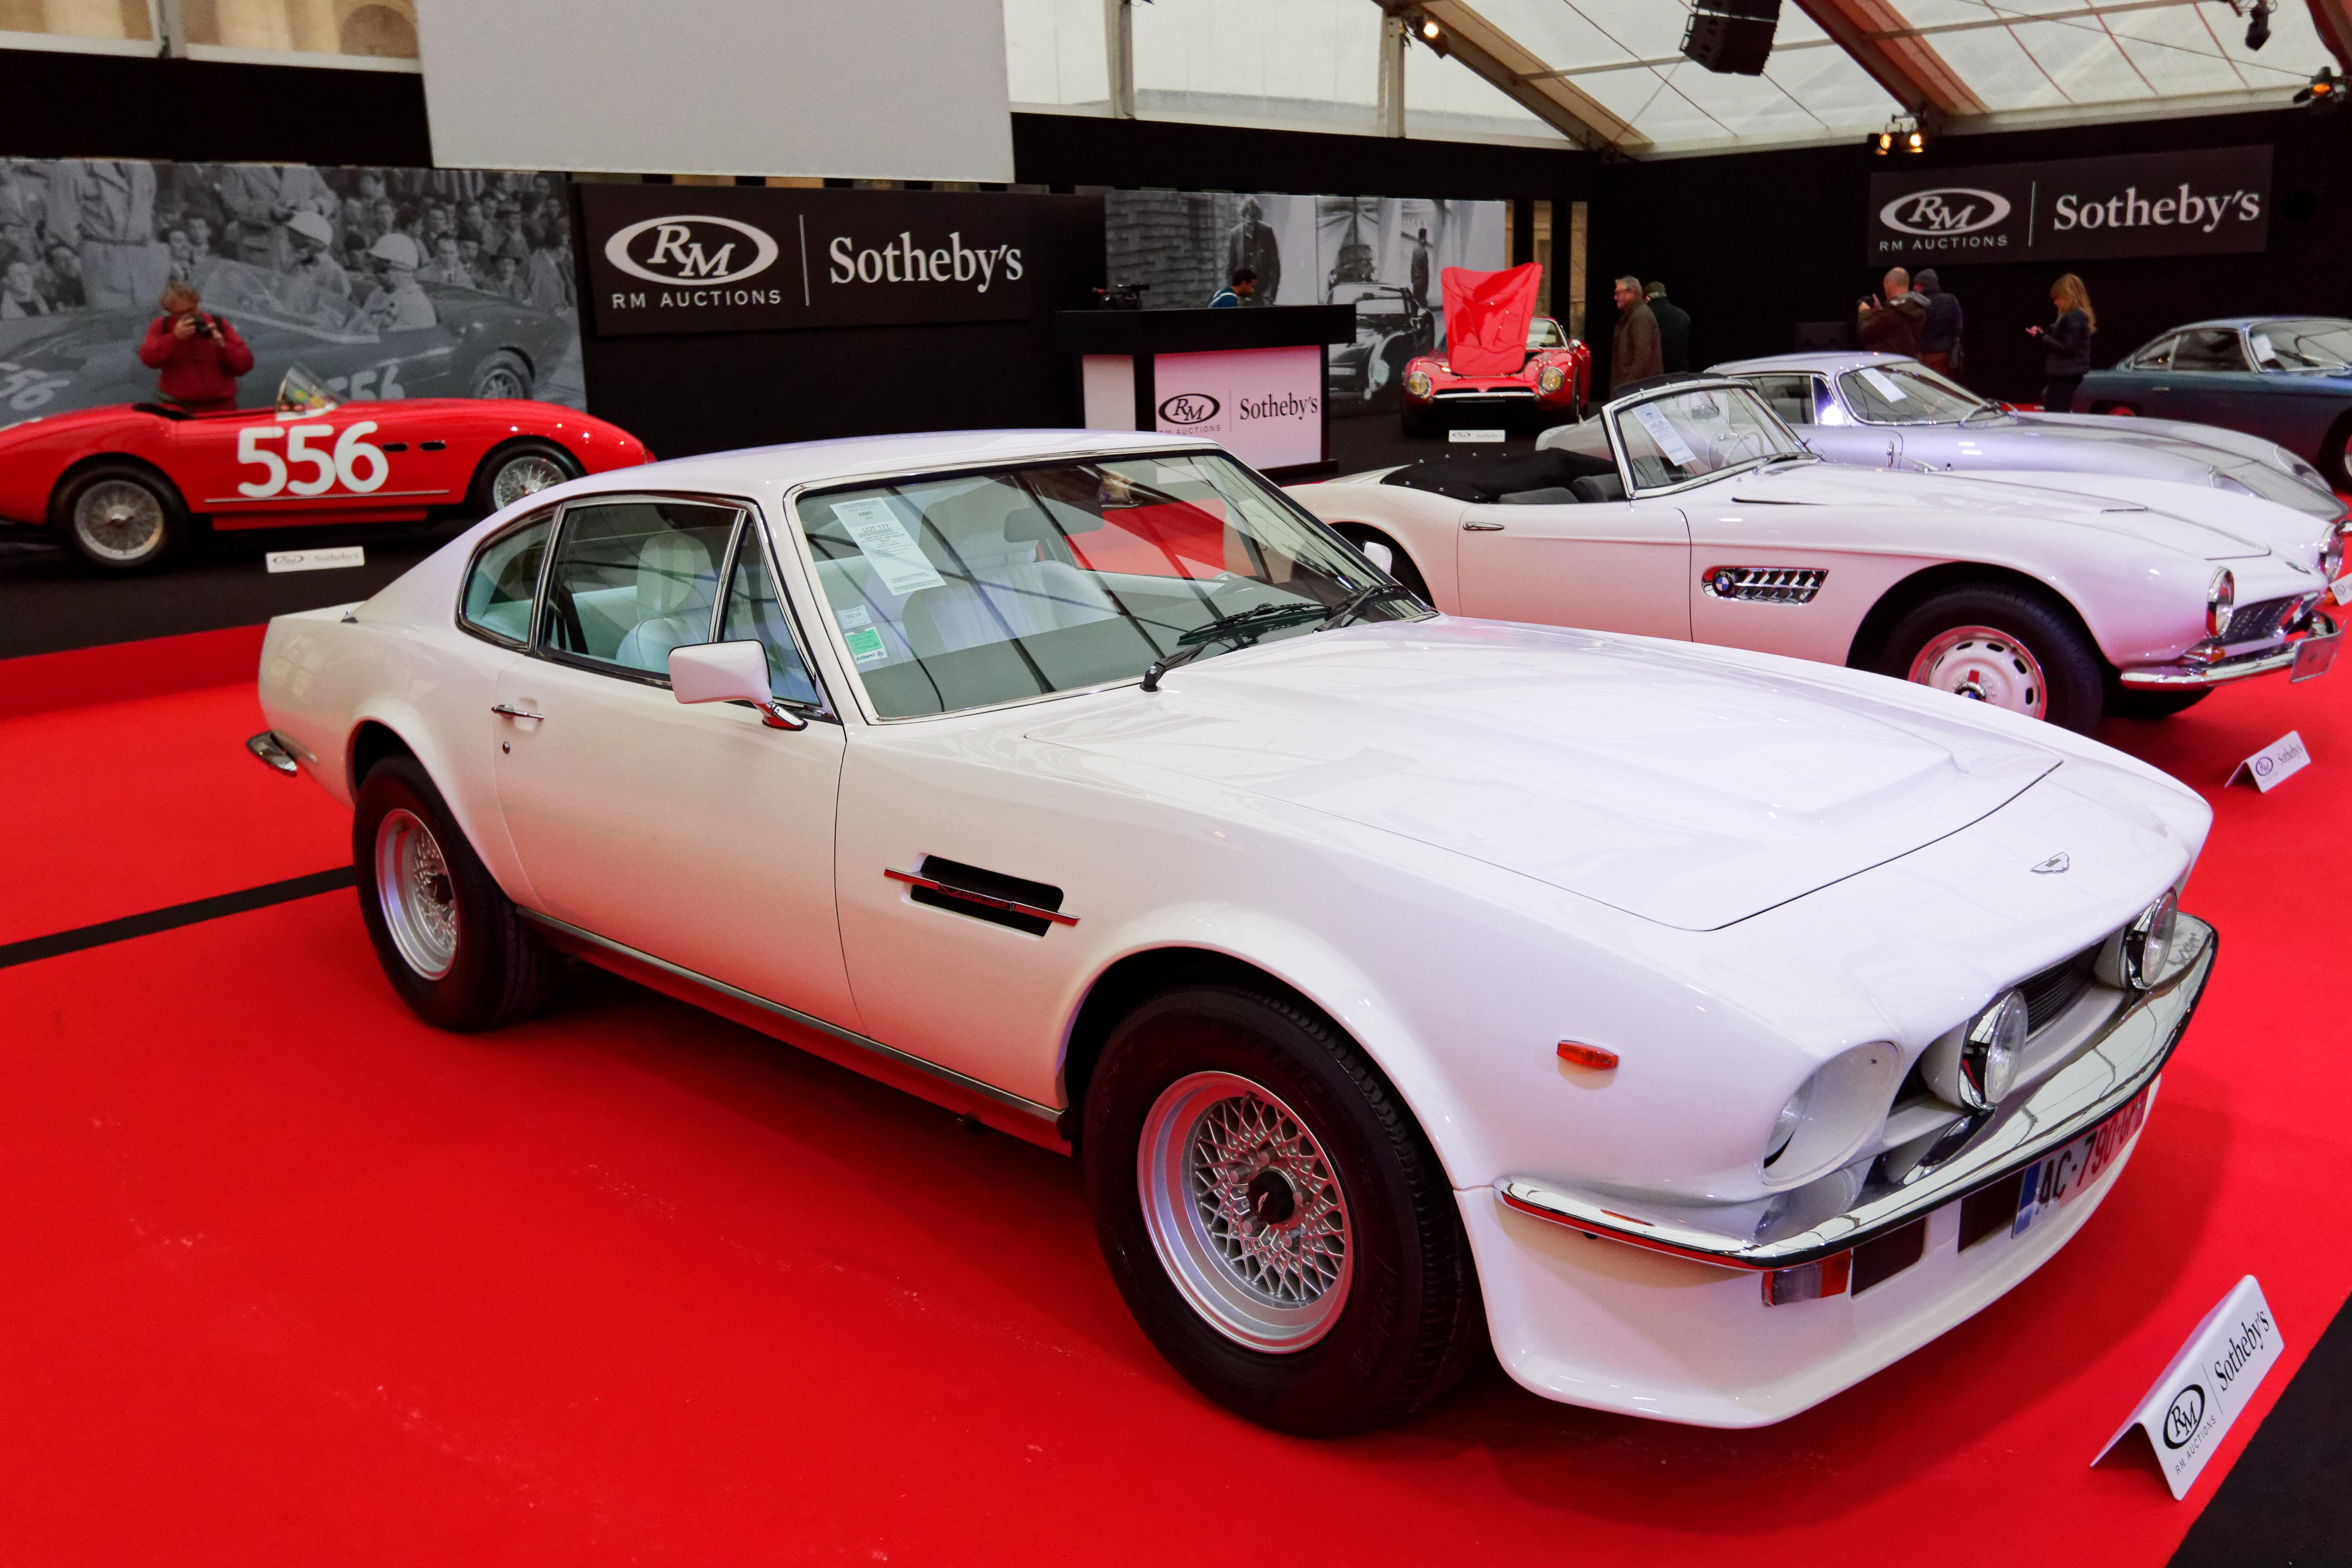 File Paris Rm Sotheby S 2018 Aston Martin V8 Vantage V580 Oscar India 1983 002 Jpg Wikimedia Commons